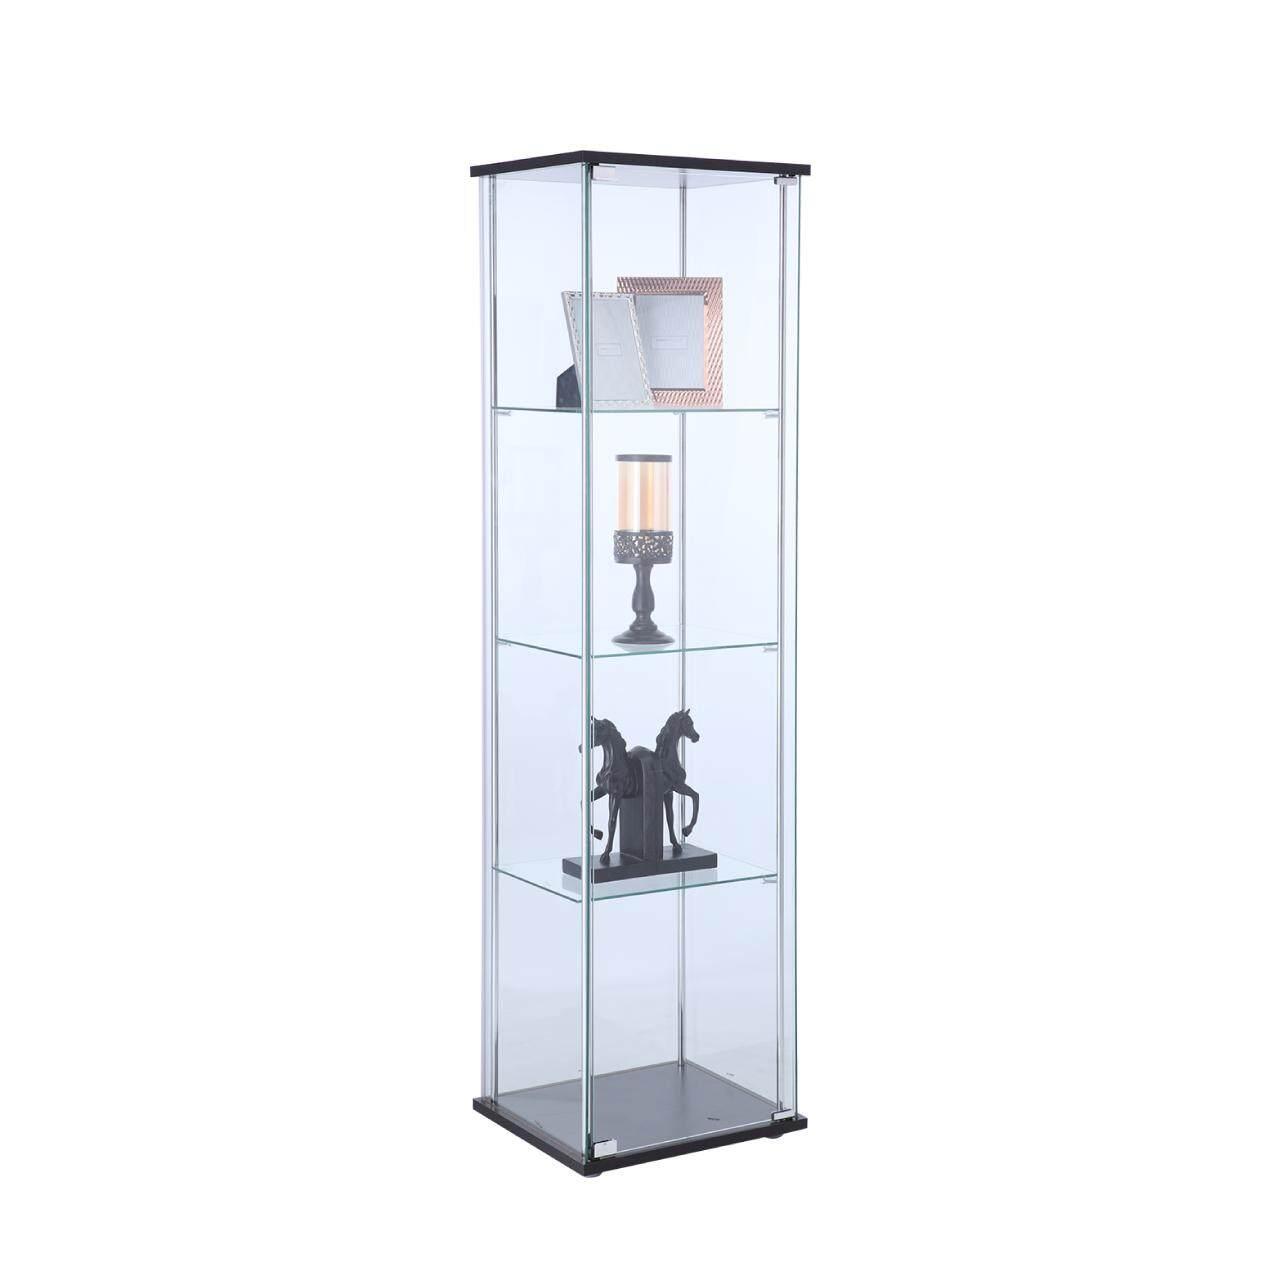 Winner Furniture ตู้โชว์กระจก รุ่น กลอรี่ 42.5 ซม. - สีดำ By Index Living Mall Official Store.